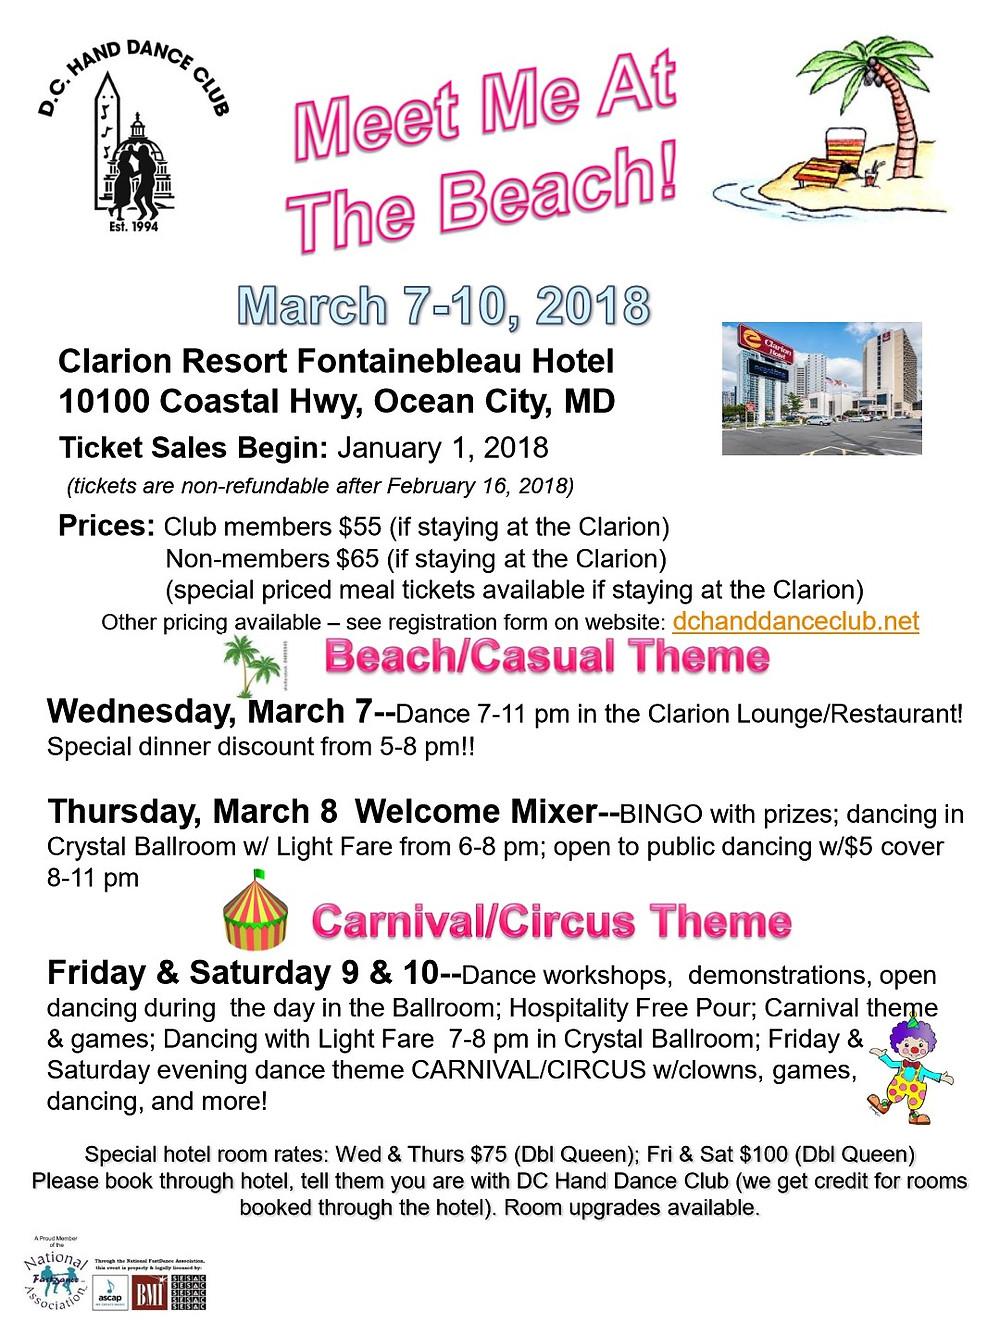 Meet Me At The Beach Event